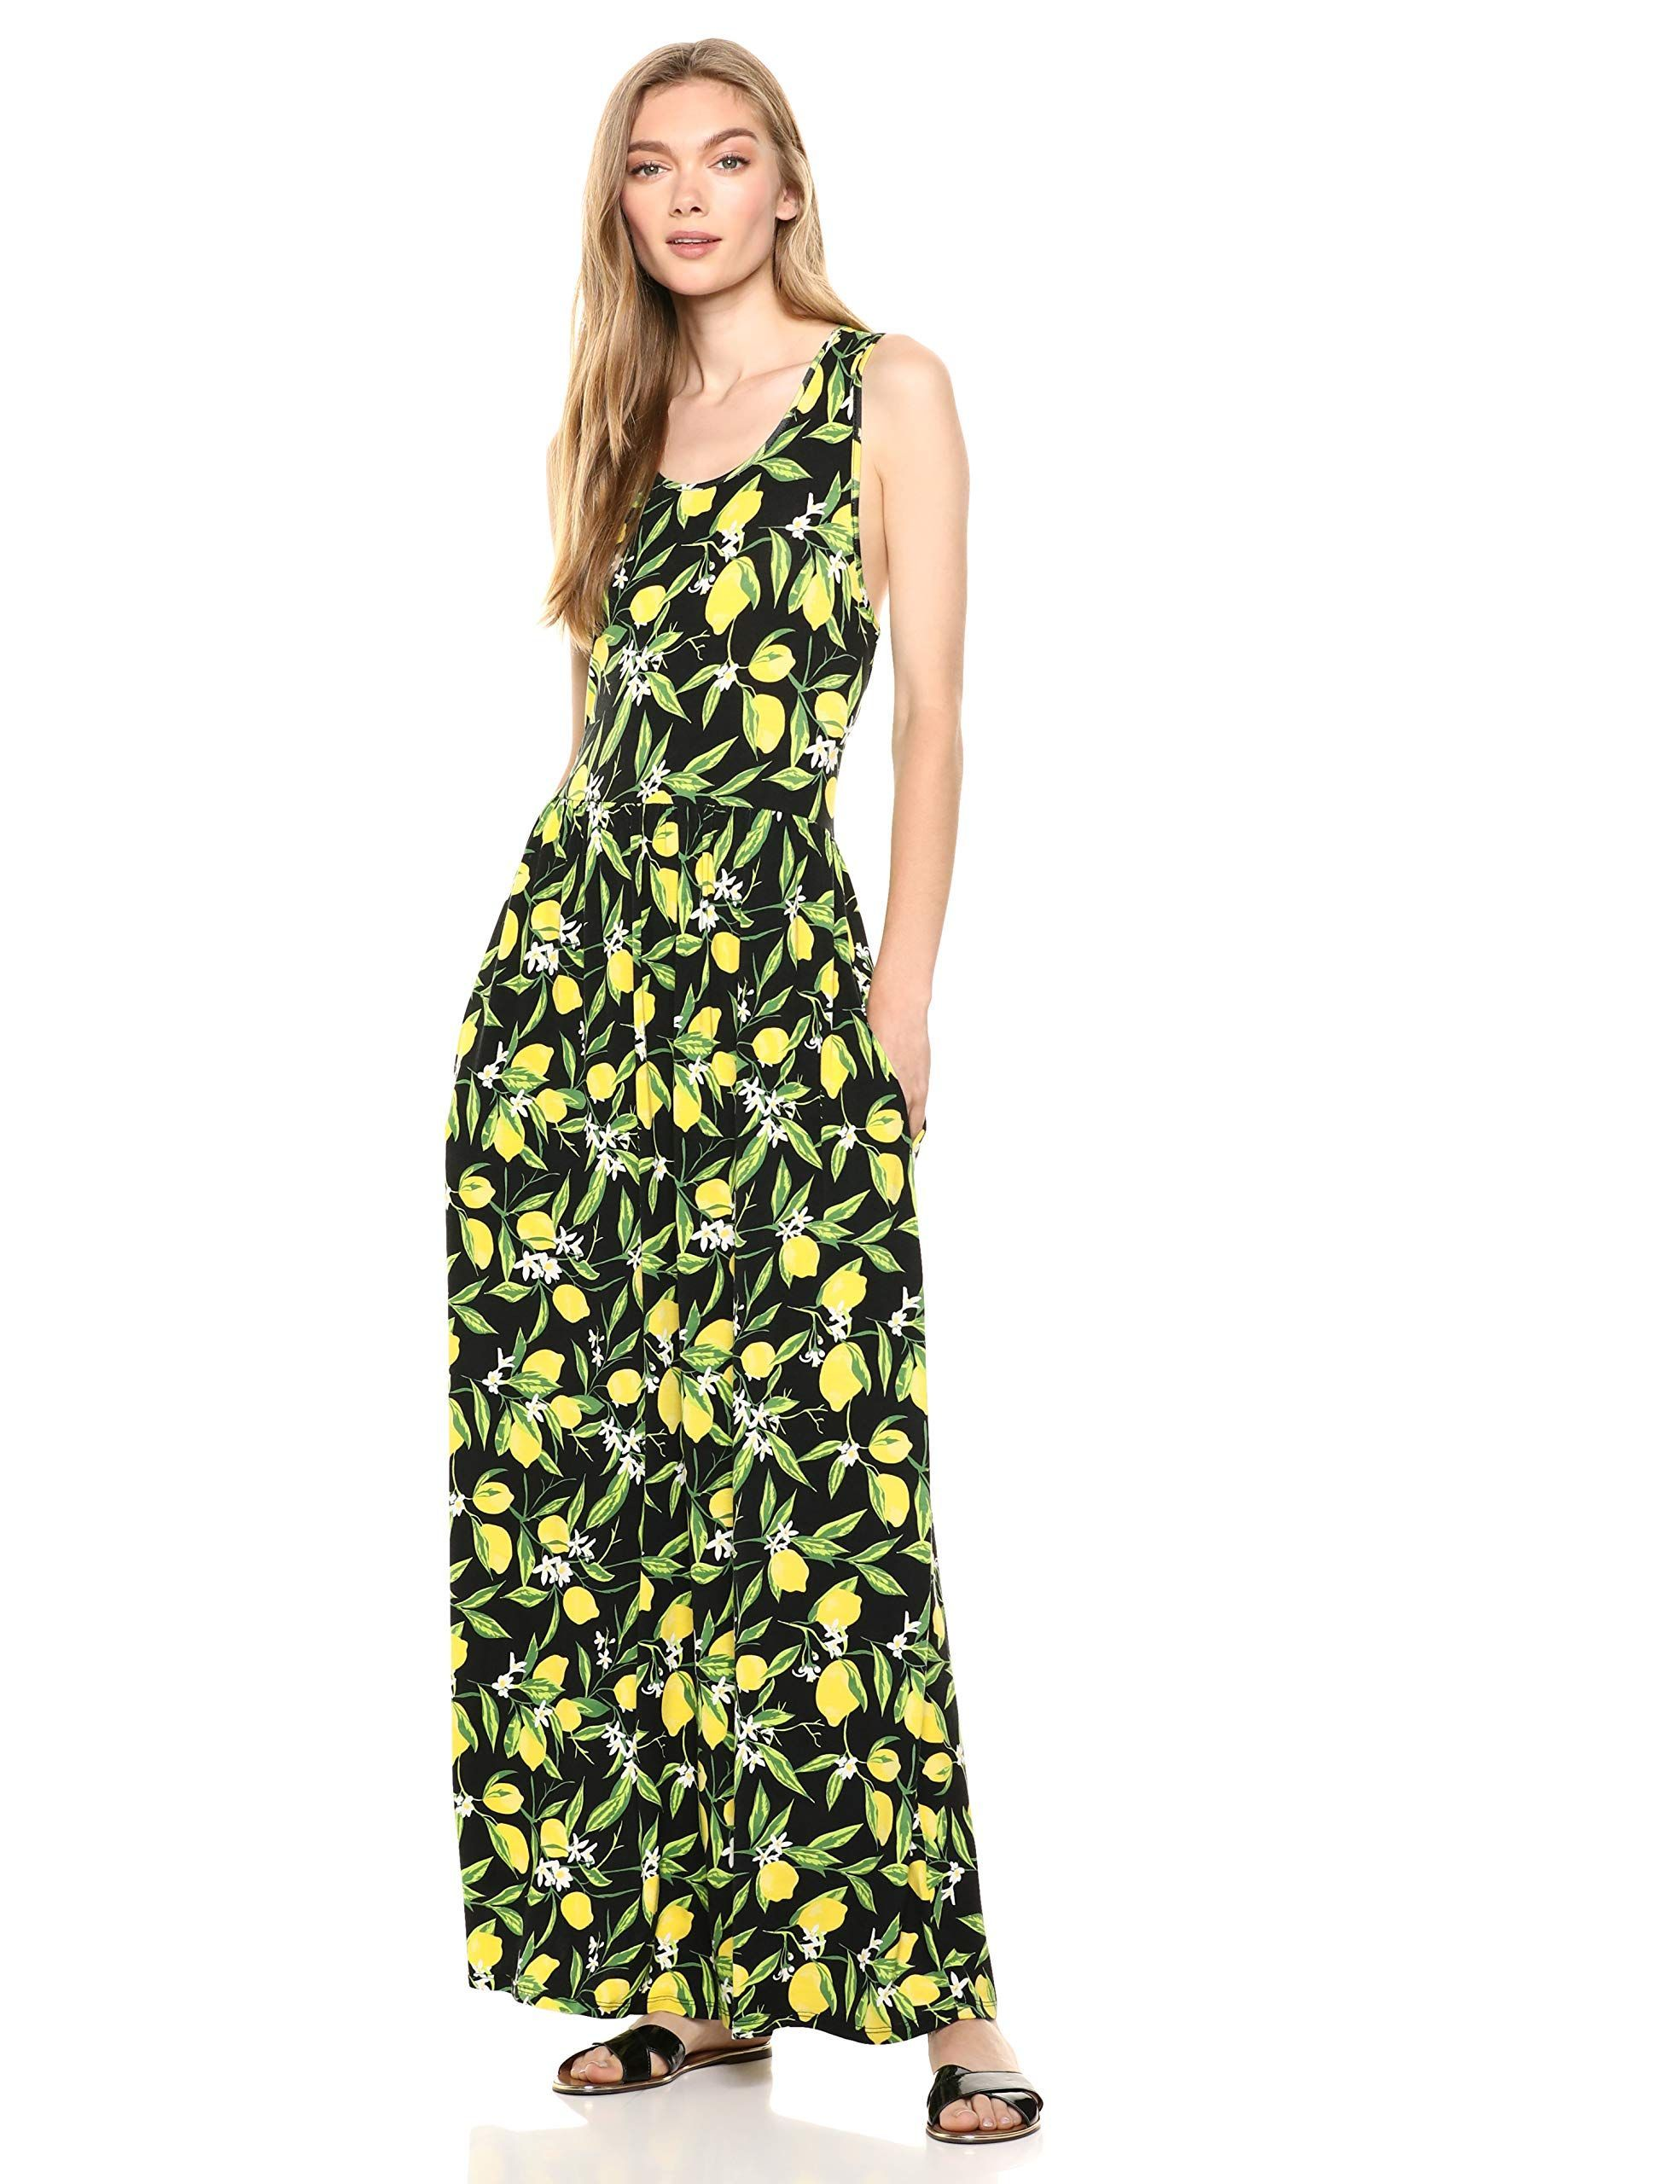 Amazon Brand 28 Palms Women S Tropical Hawaiian Print Sleeveless Maxi Dress With Pockets Maxi Dress Sleeveless Maxi Dress Floor Length Maxi Dress [ 2560 x 1969 Pixel ]